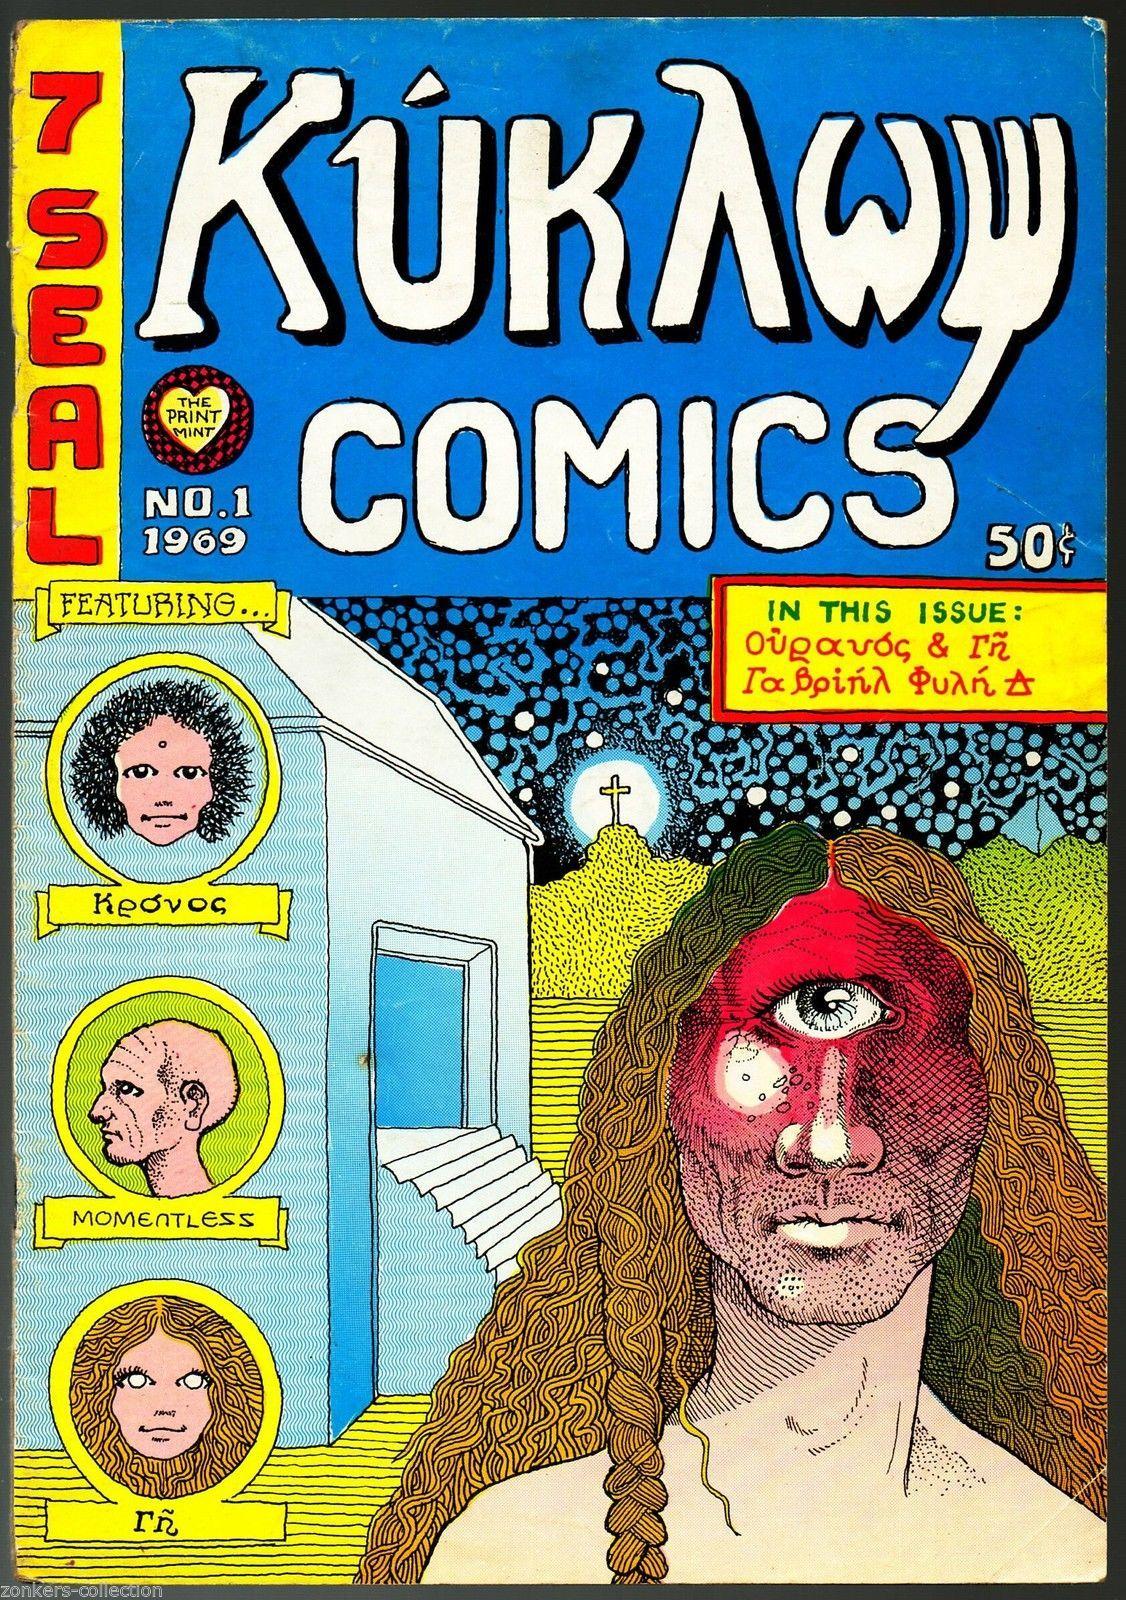 Kukawy Comics (cyclops) - Print Mint 1969, John Thompson, underground comix,